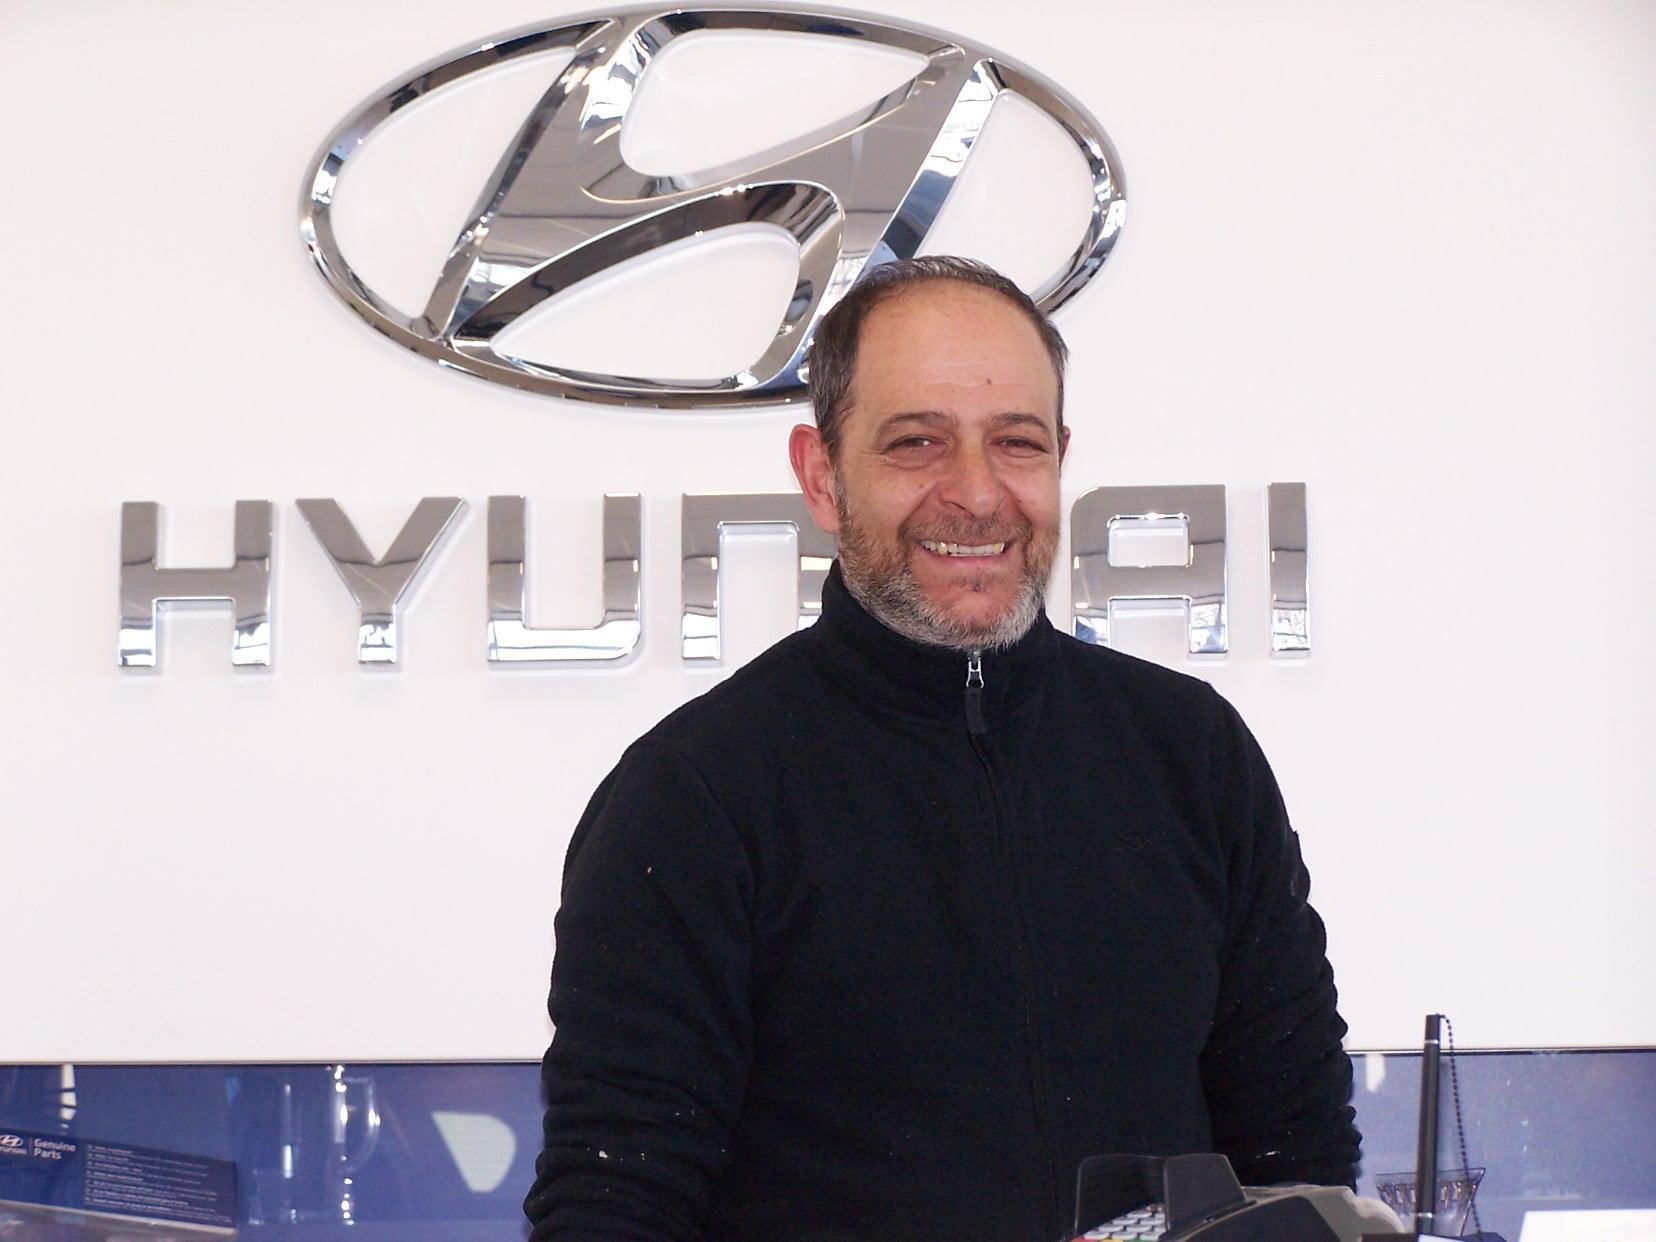 Bahadir Aydin